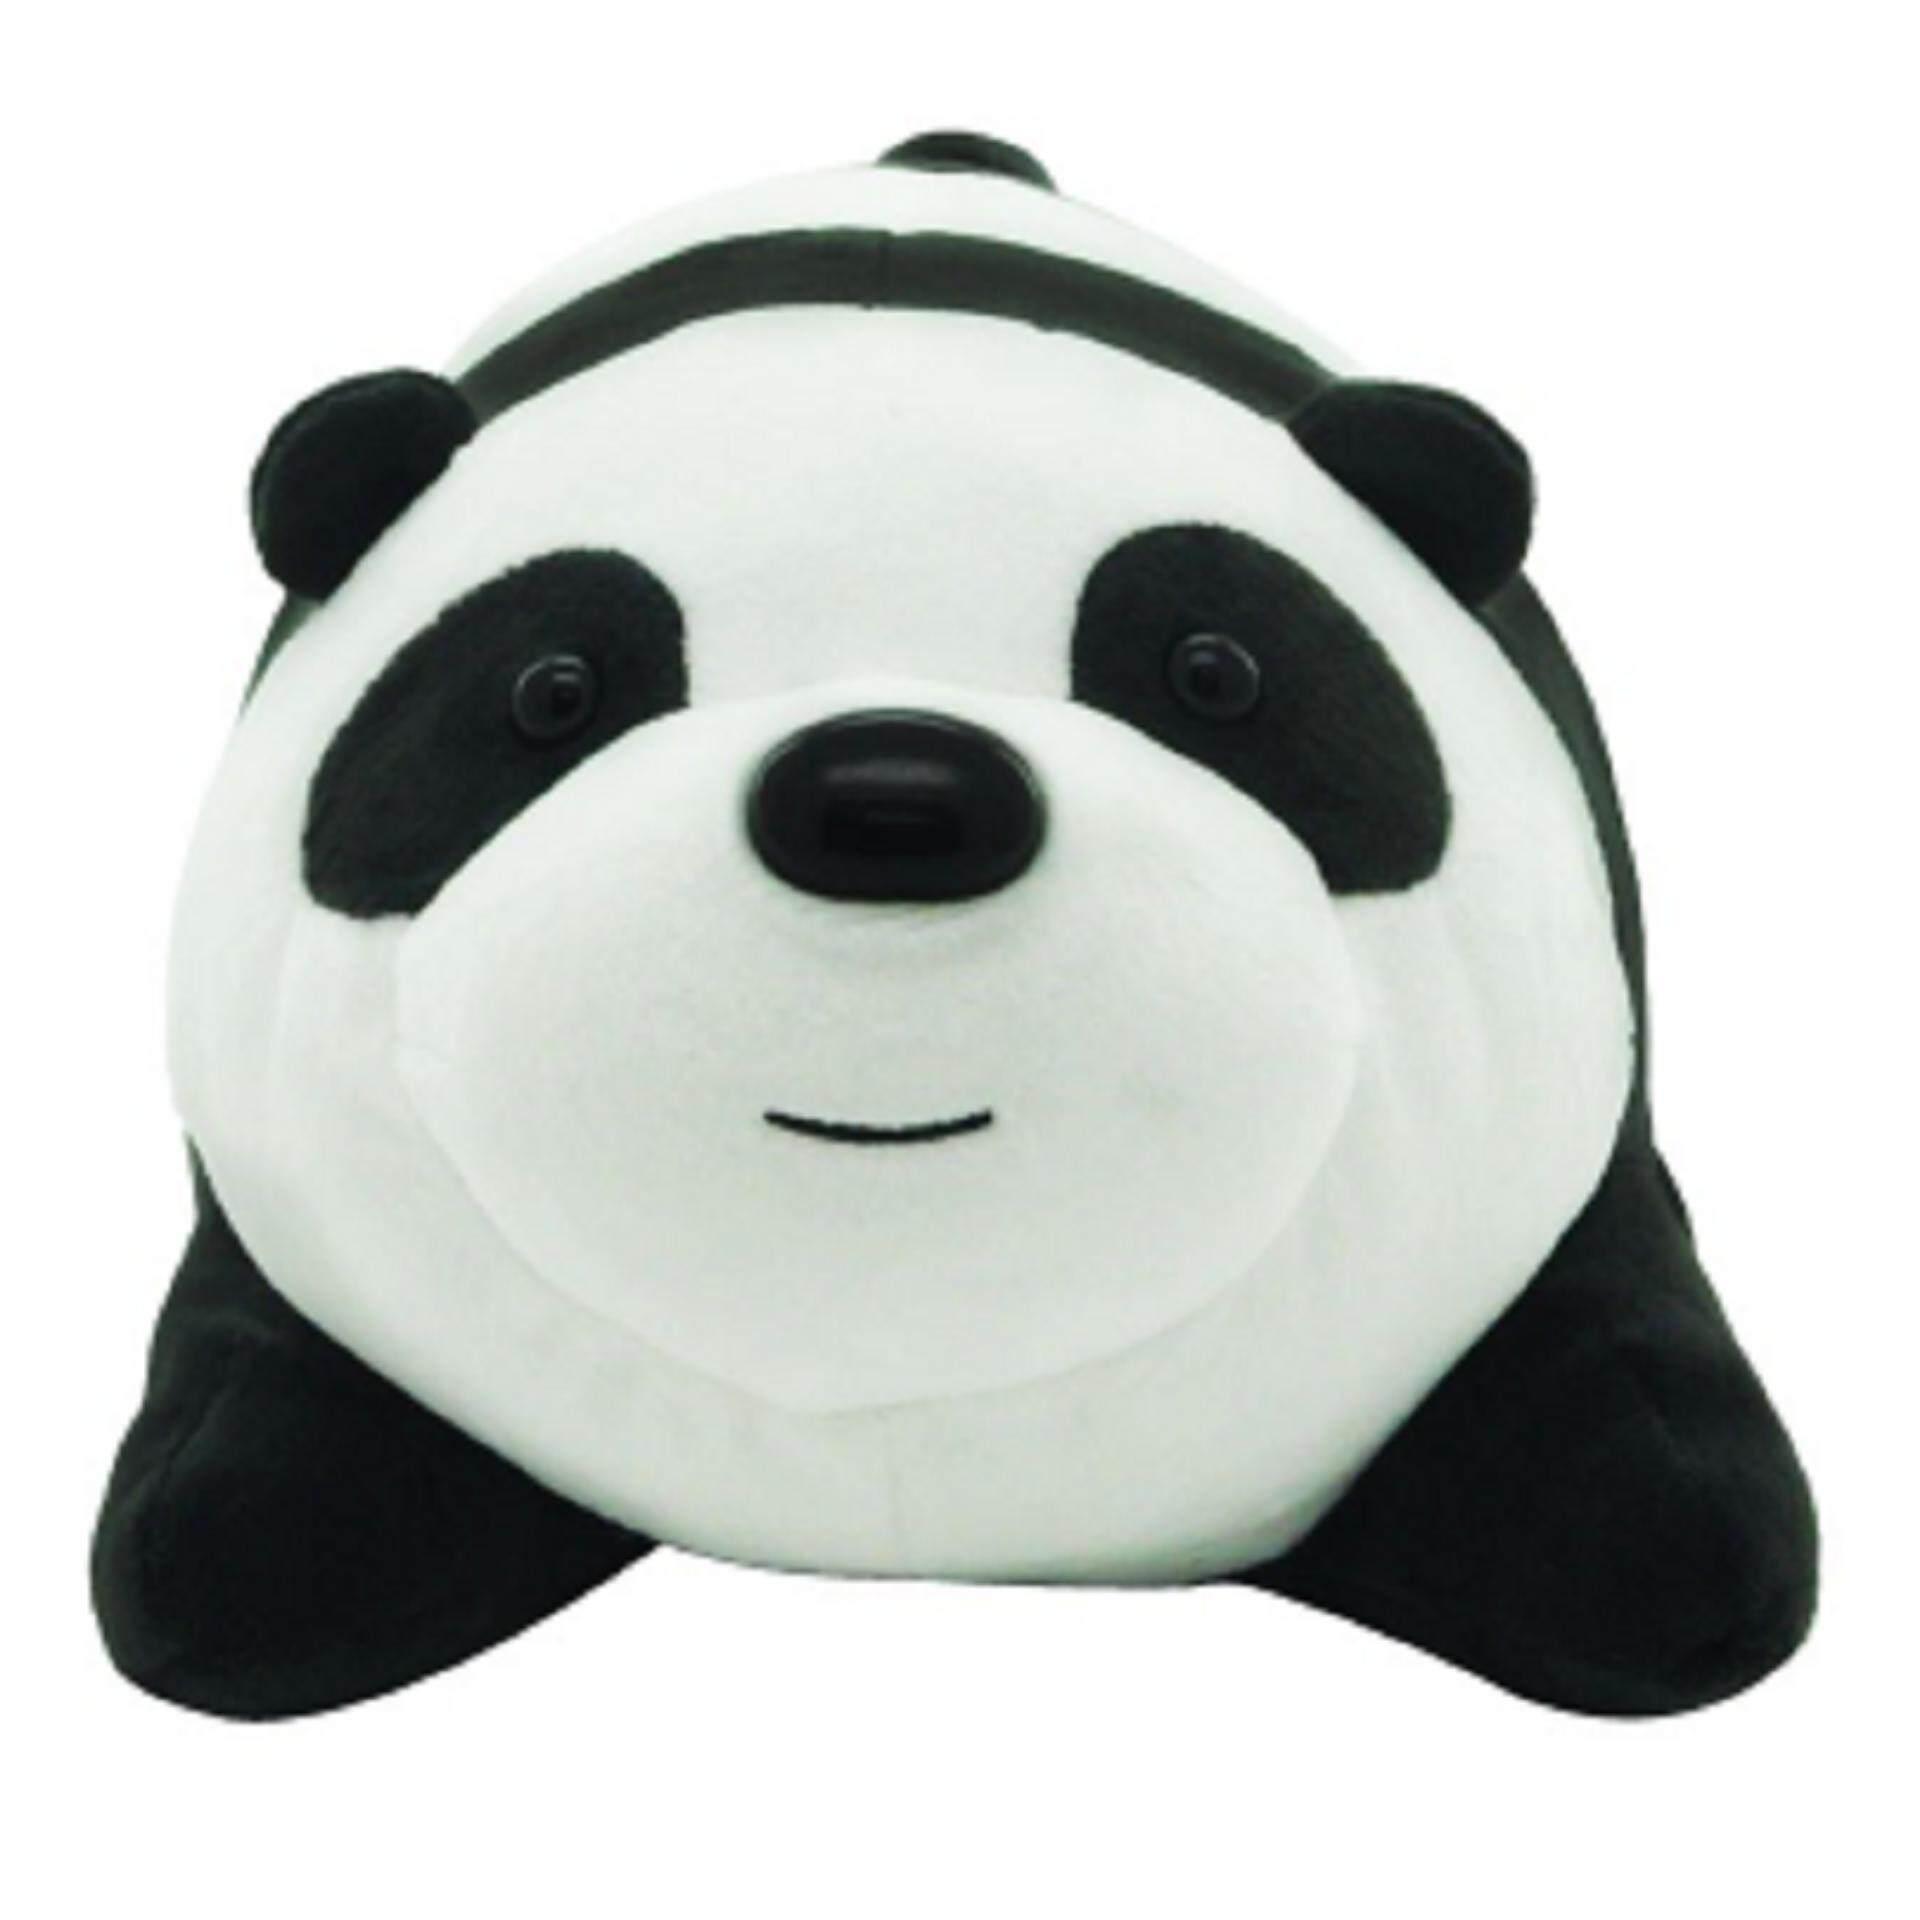 We Bare Bears Plush Cushion 14 Inches - Panda